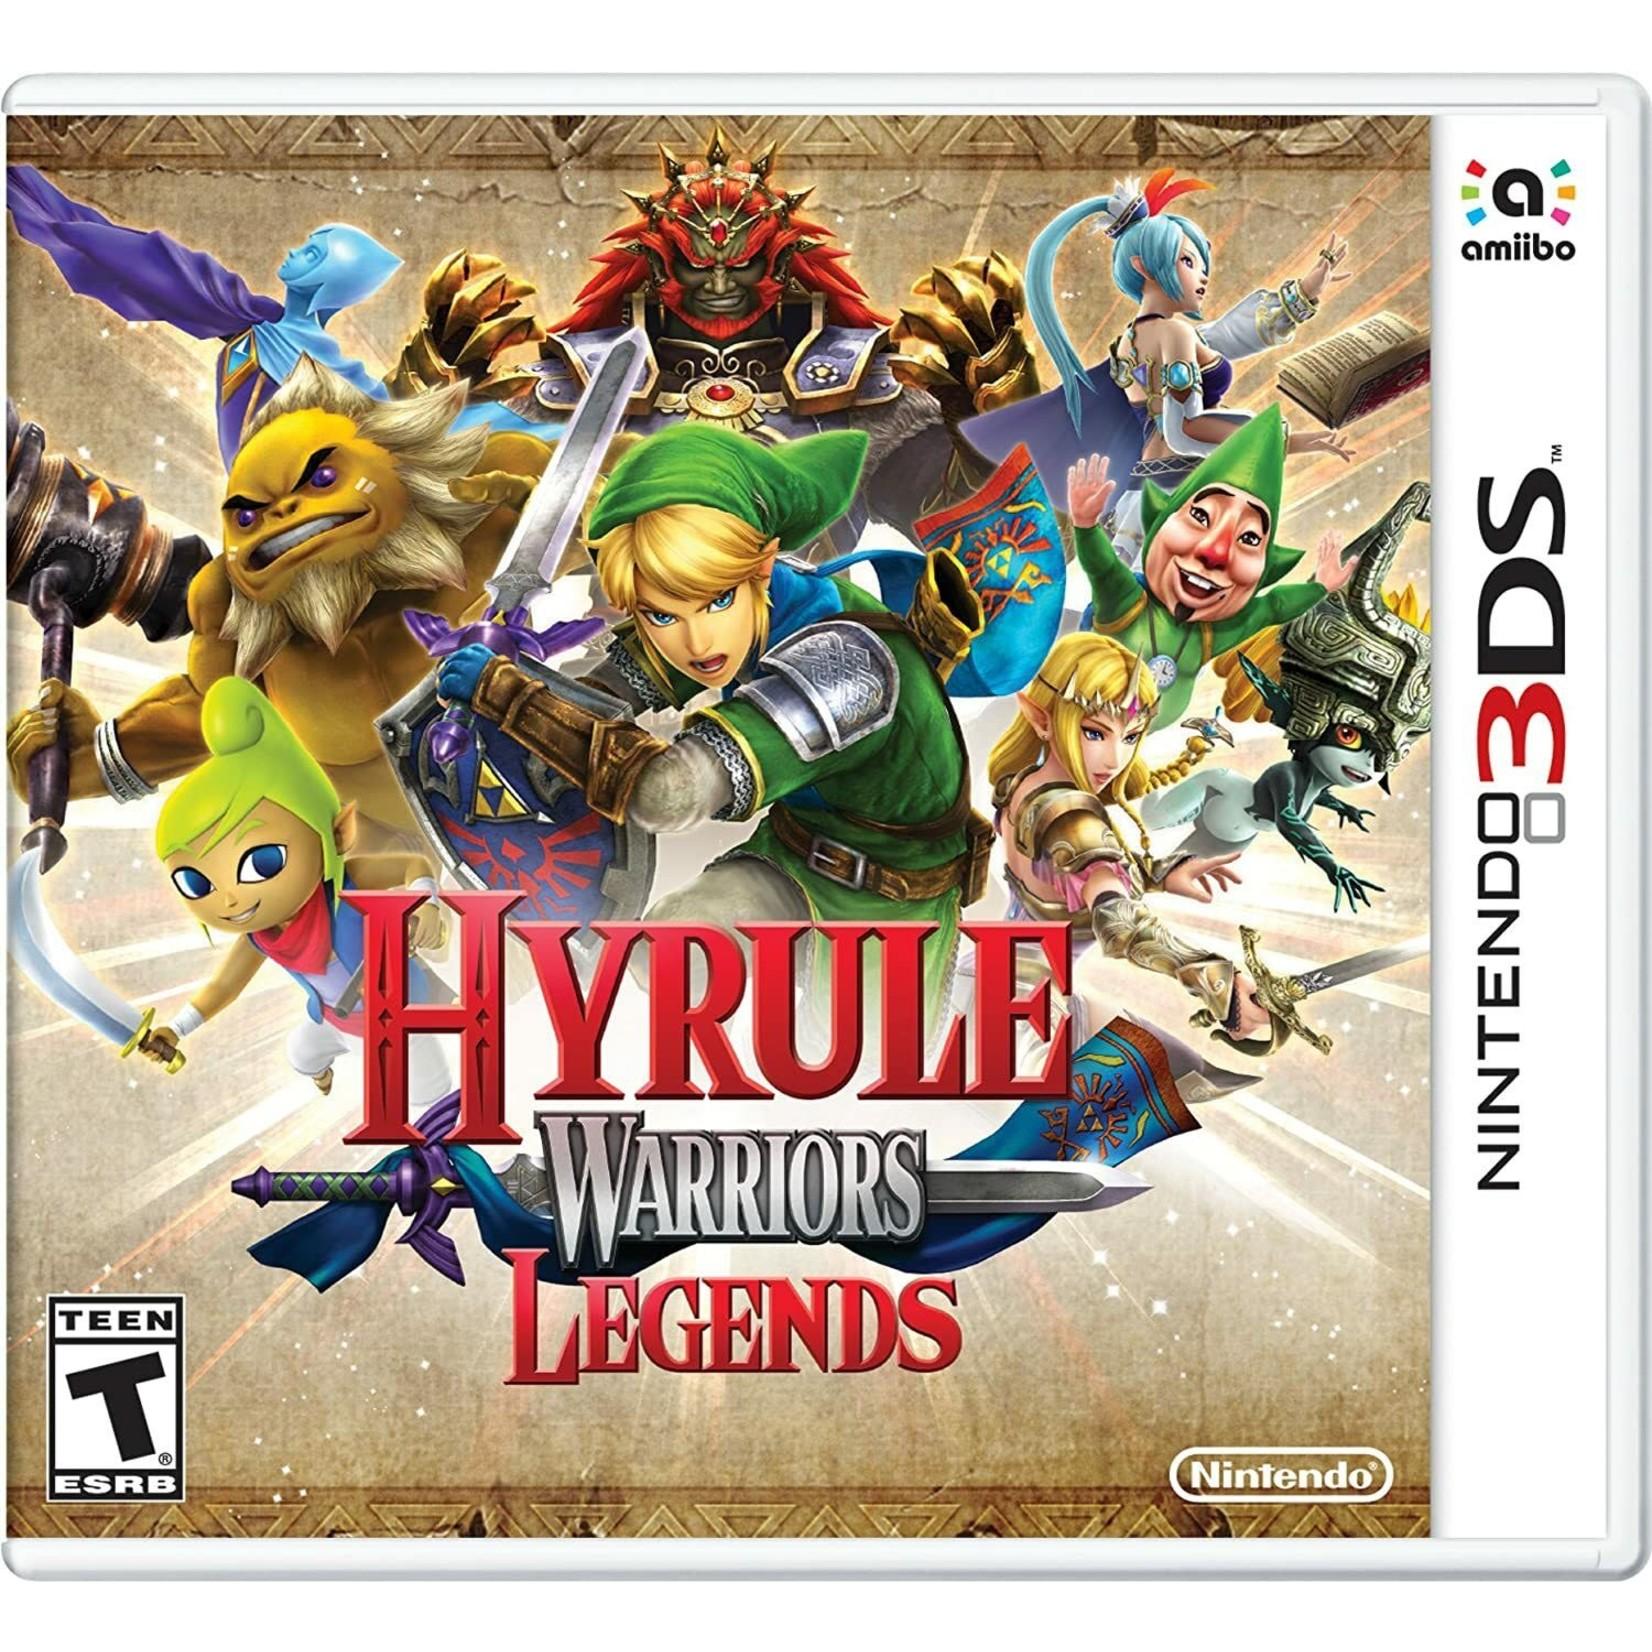 3DS-Hyrule Warriors: Legends